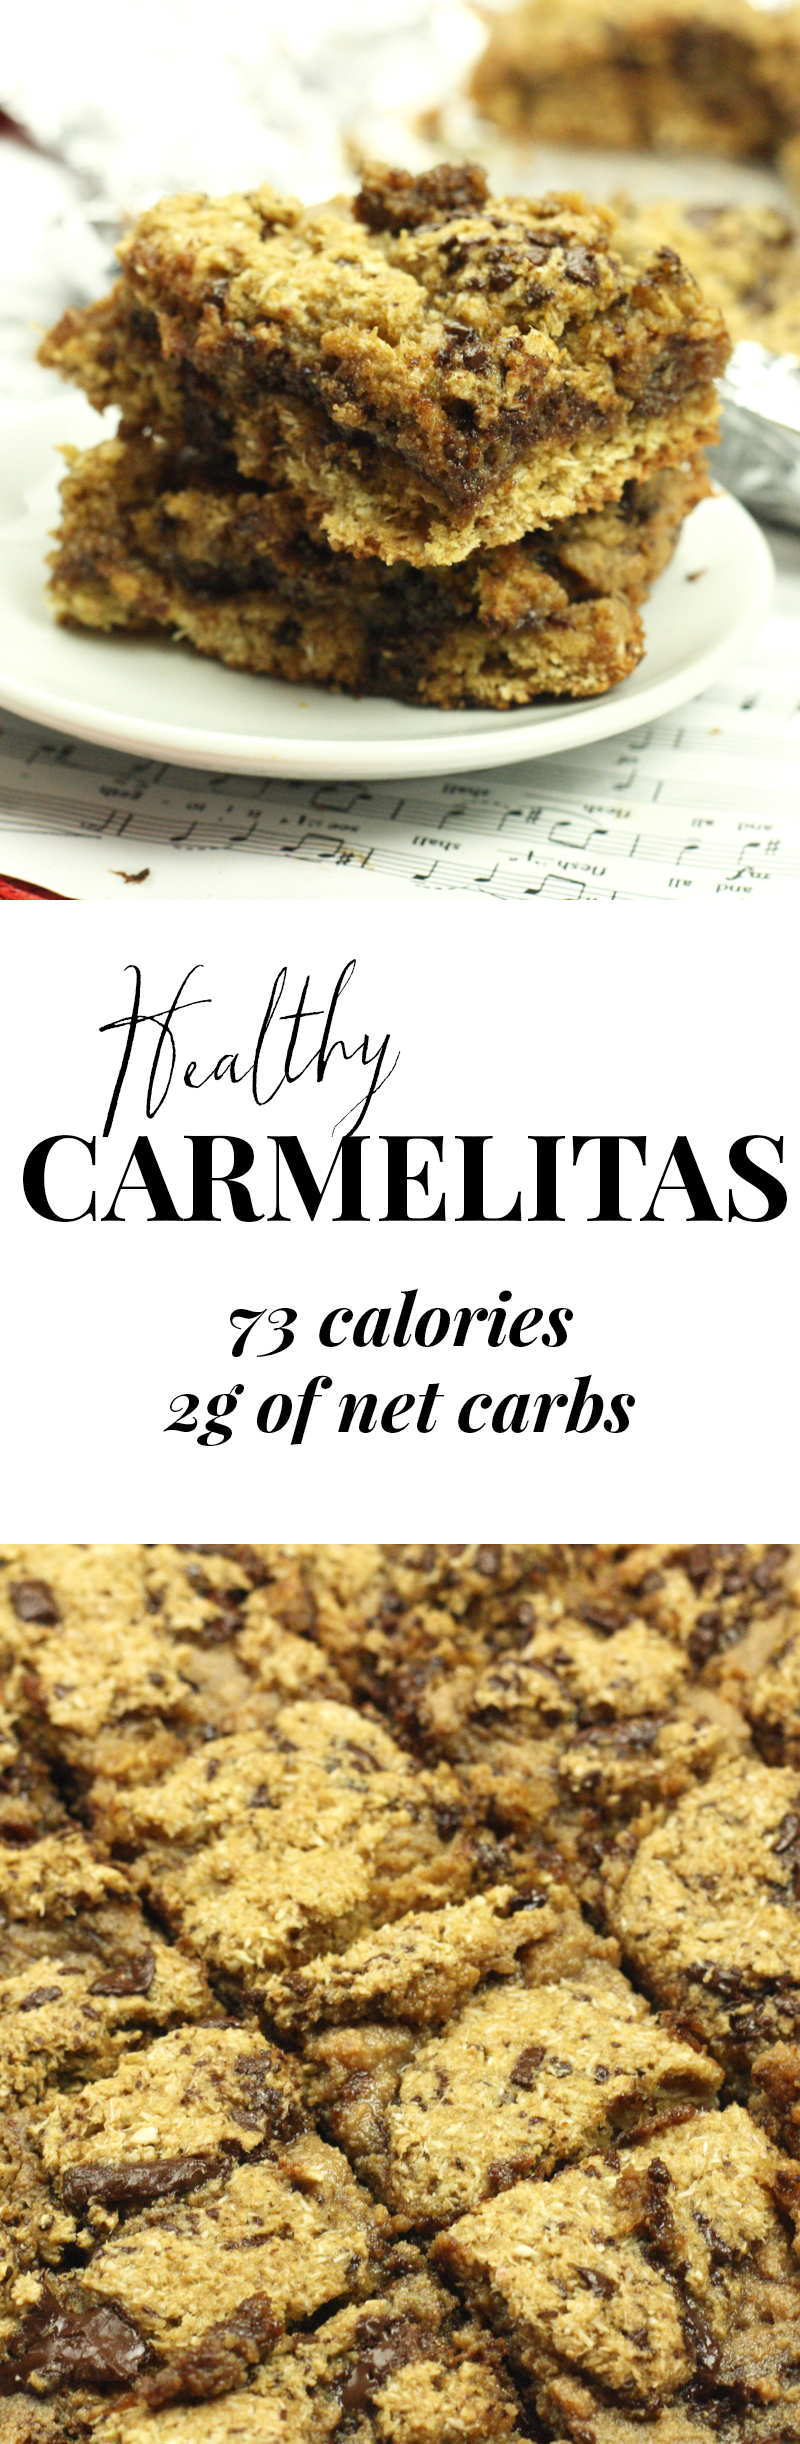 Carmelitas Pinterest